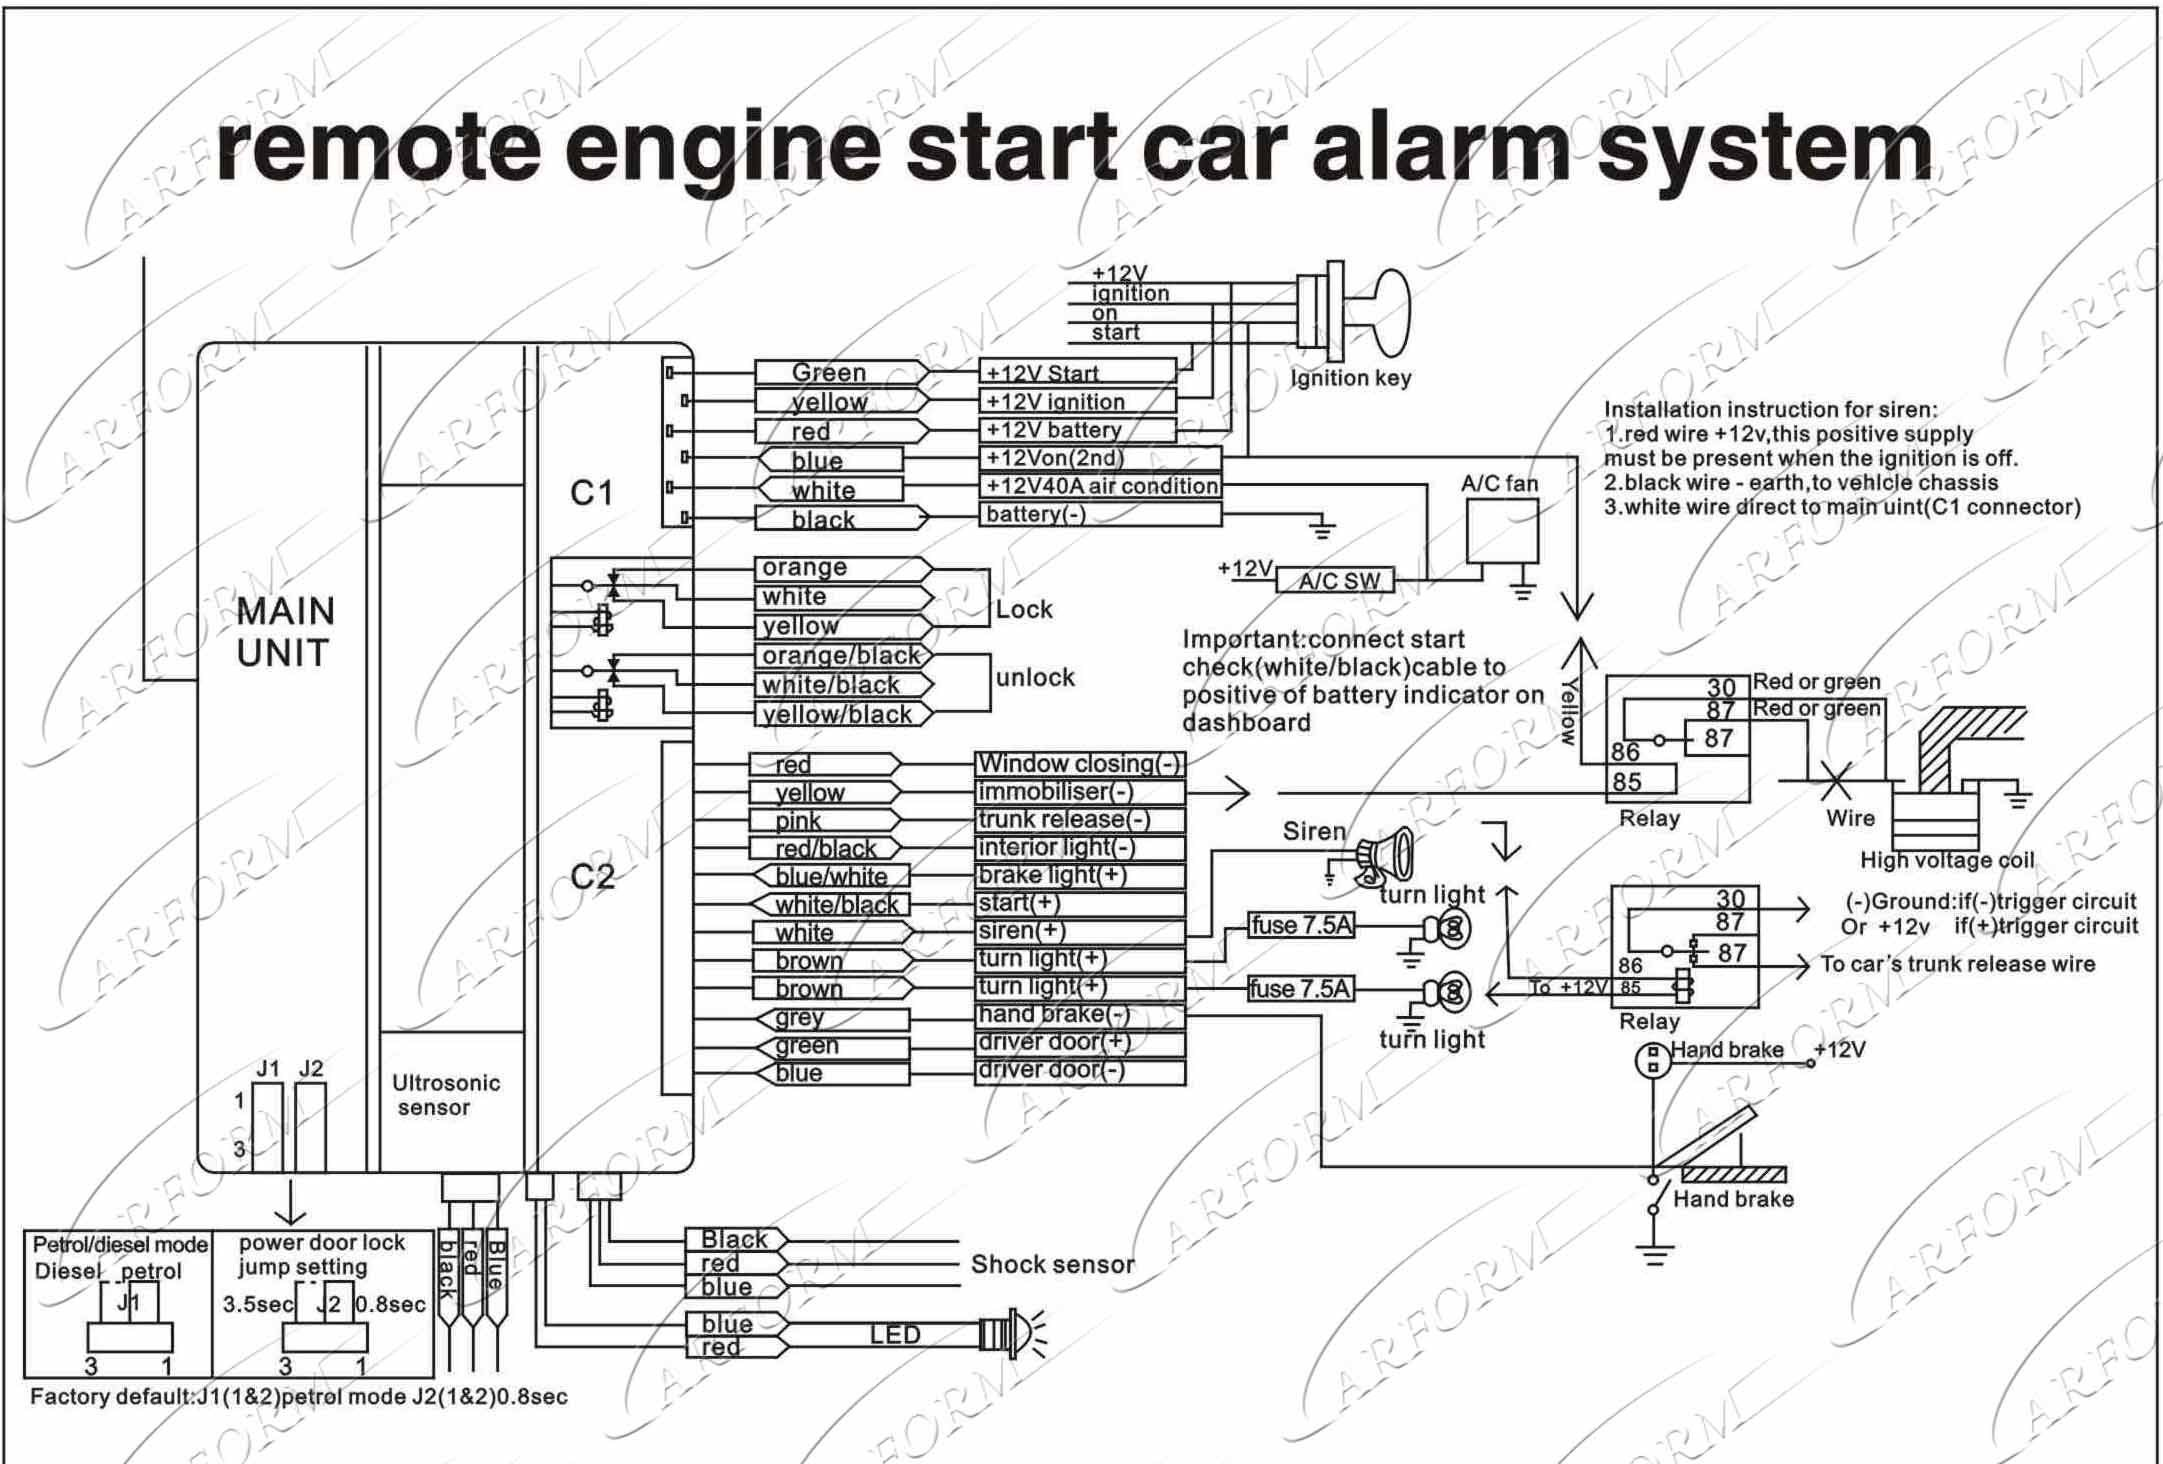 Car alarm system diagram alarm wiring diagrams for cars my wiring car alarm system diagram car alarm wiring diagram security download throughout diagrams of car alarm system swarovskicordoba Gallery